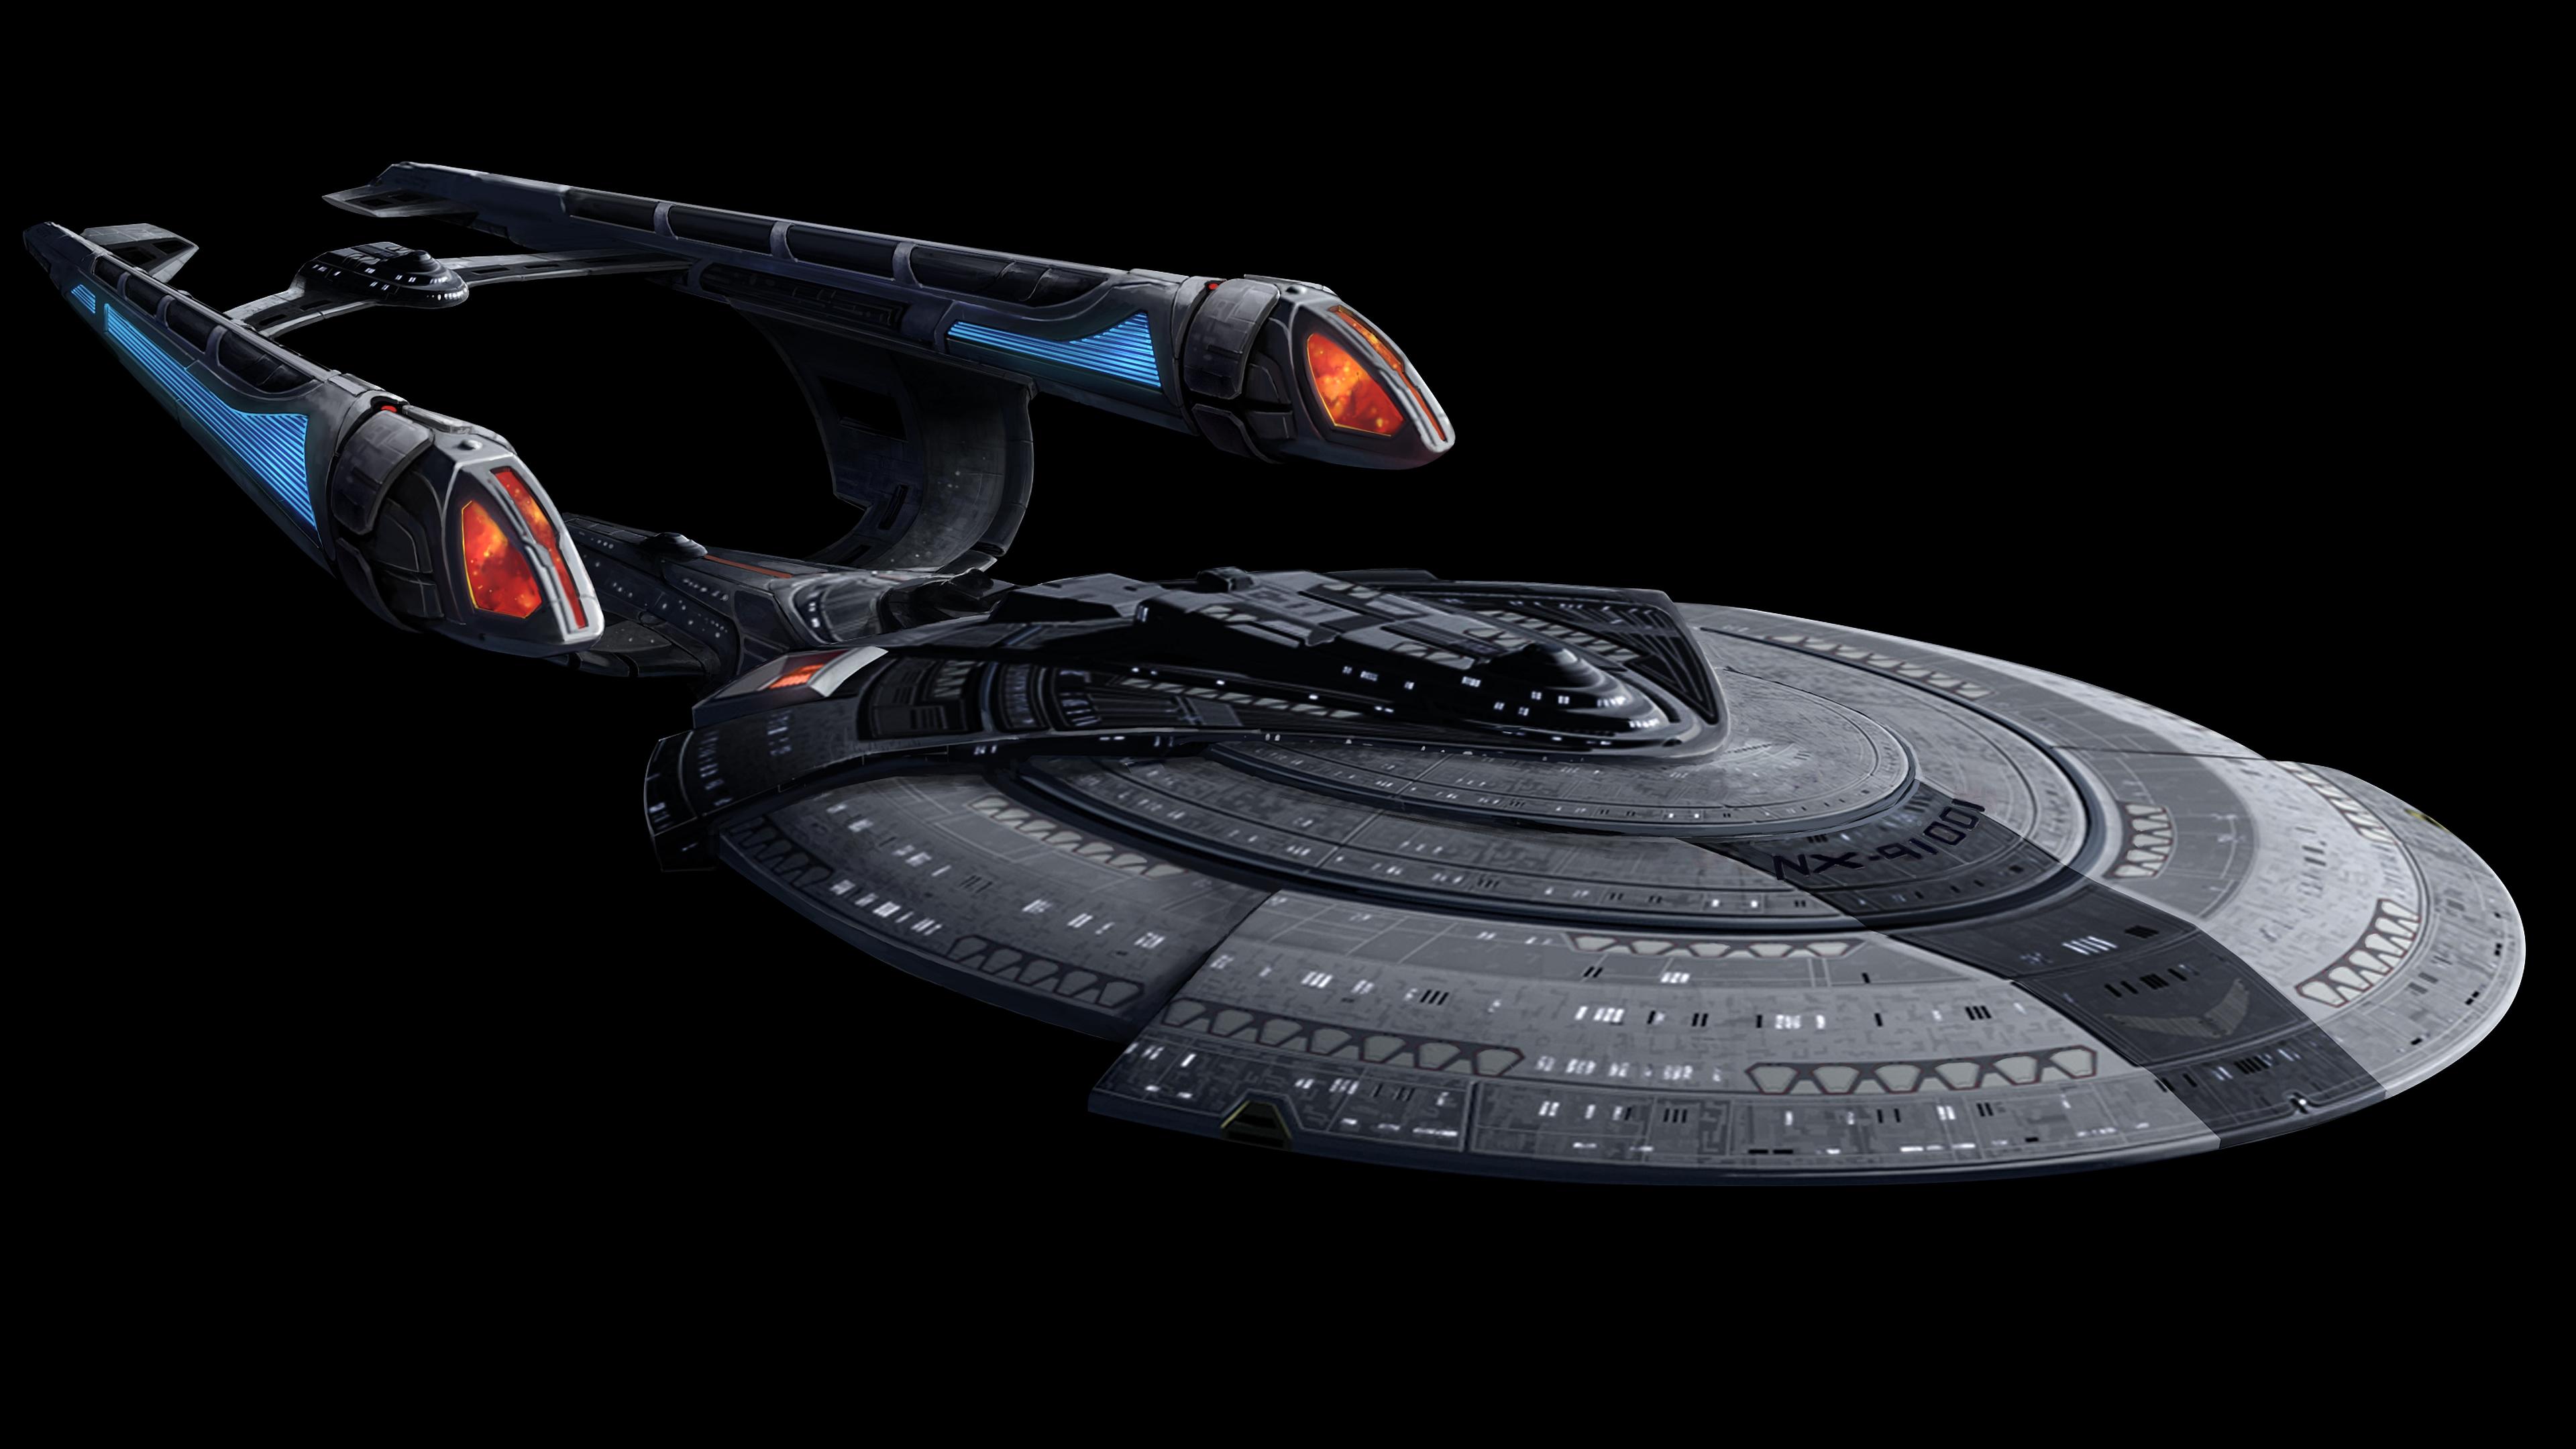 388 4k Ultra Hd Star Trek Wallpapers Background Images Wallpaper Abyss